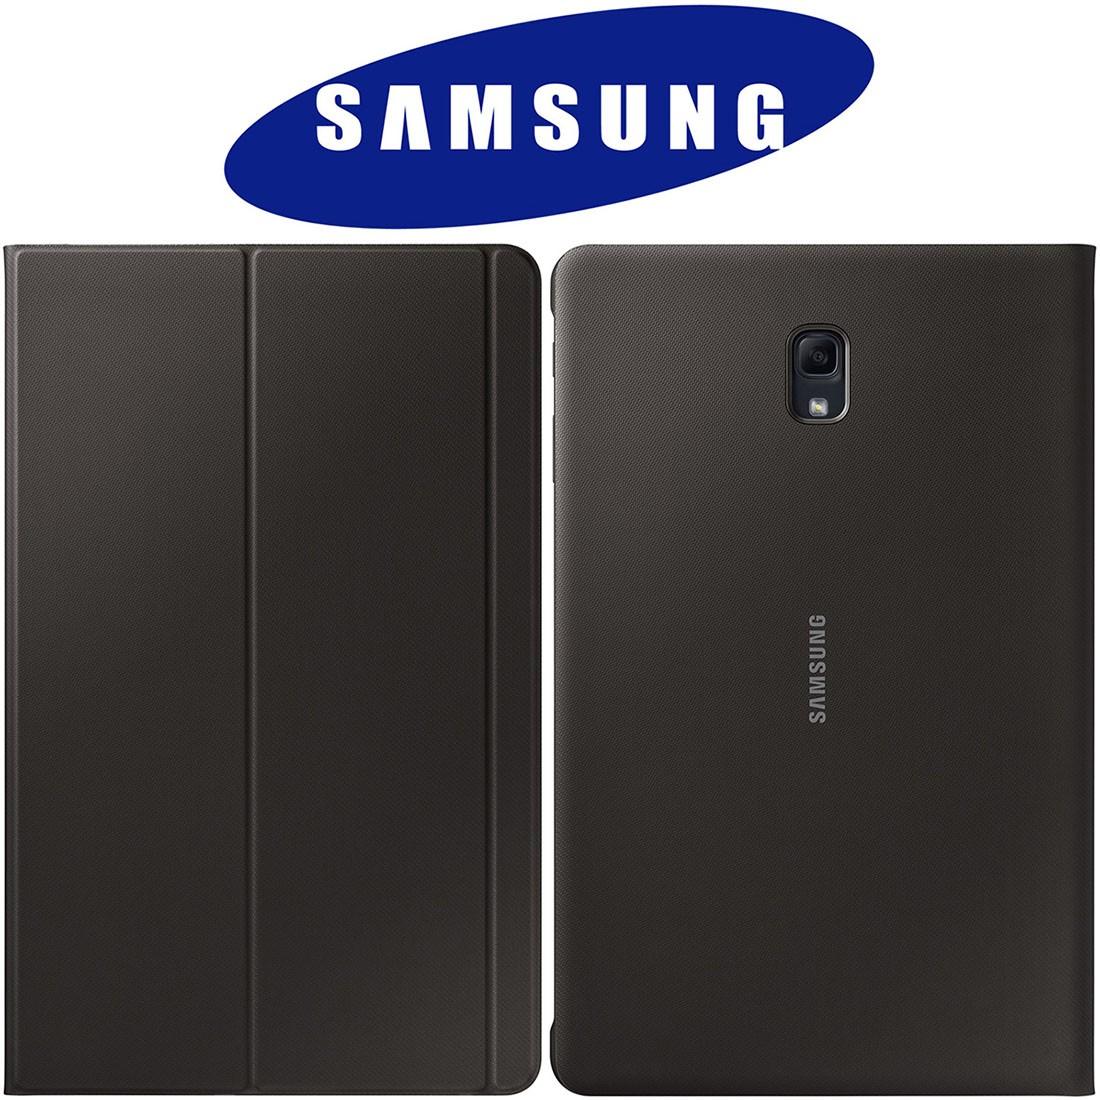 Capa Original Samsung Book Cover Galaxy Tab A 10.5 T590 T595